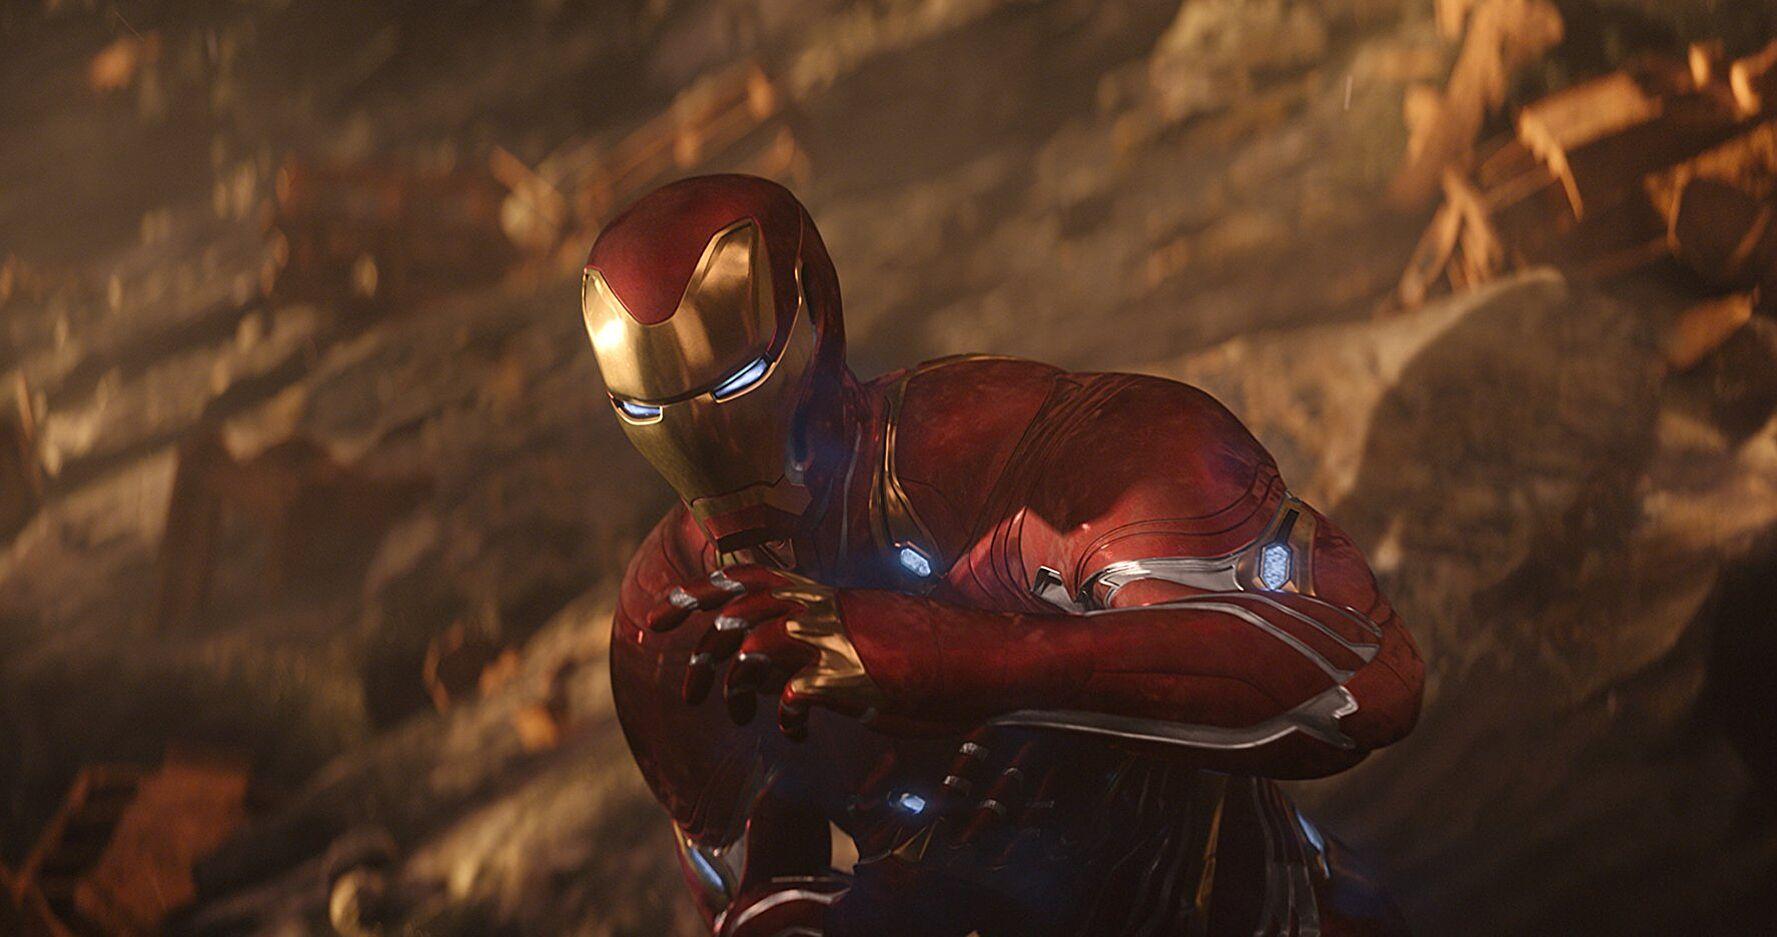 Infinity War, Iron Man, Avengers, Tony Stark